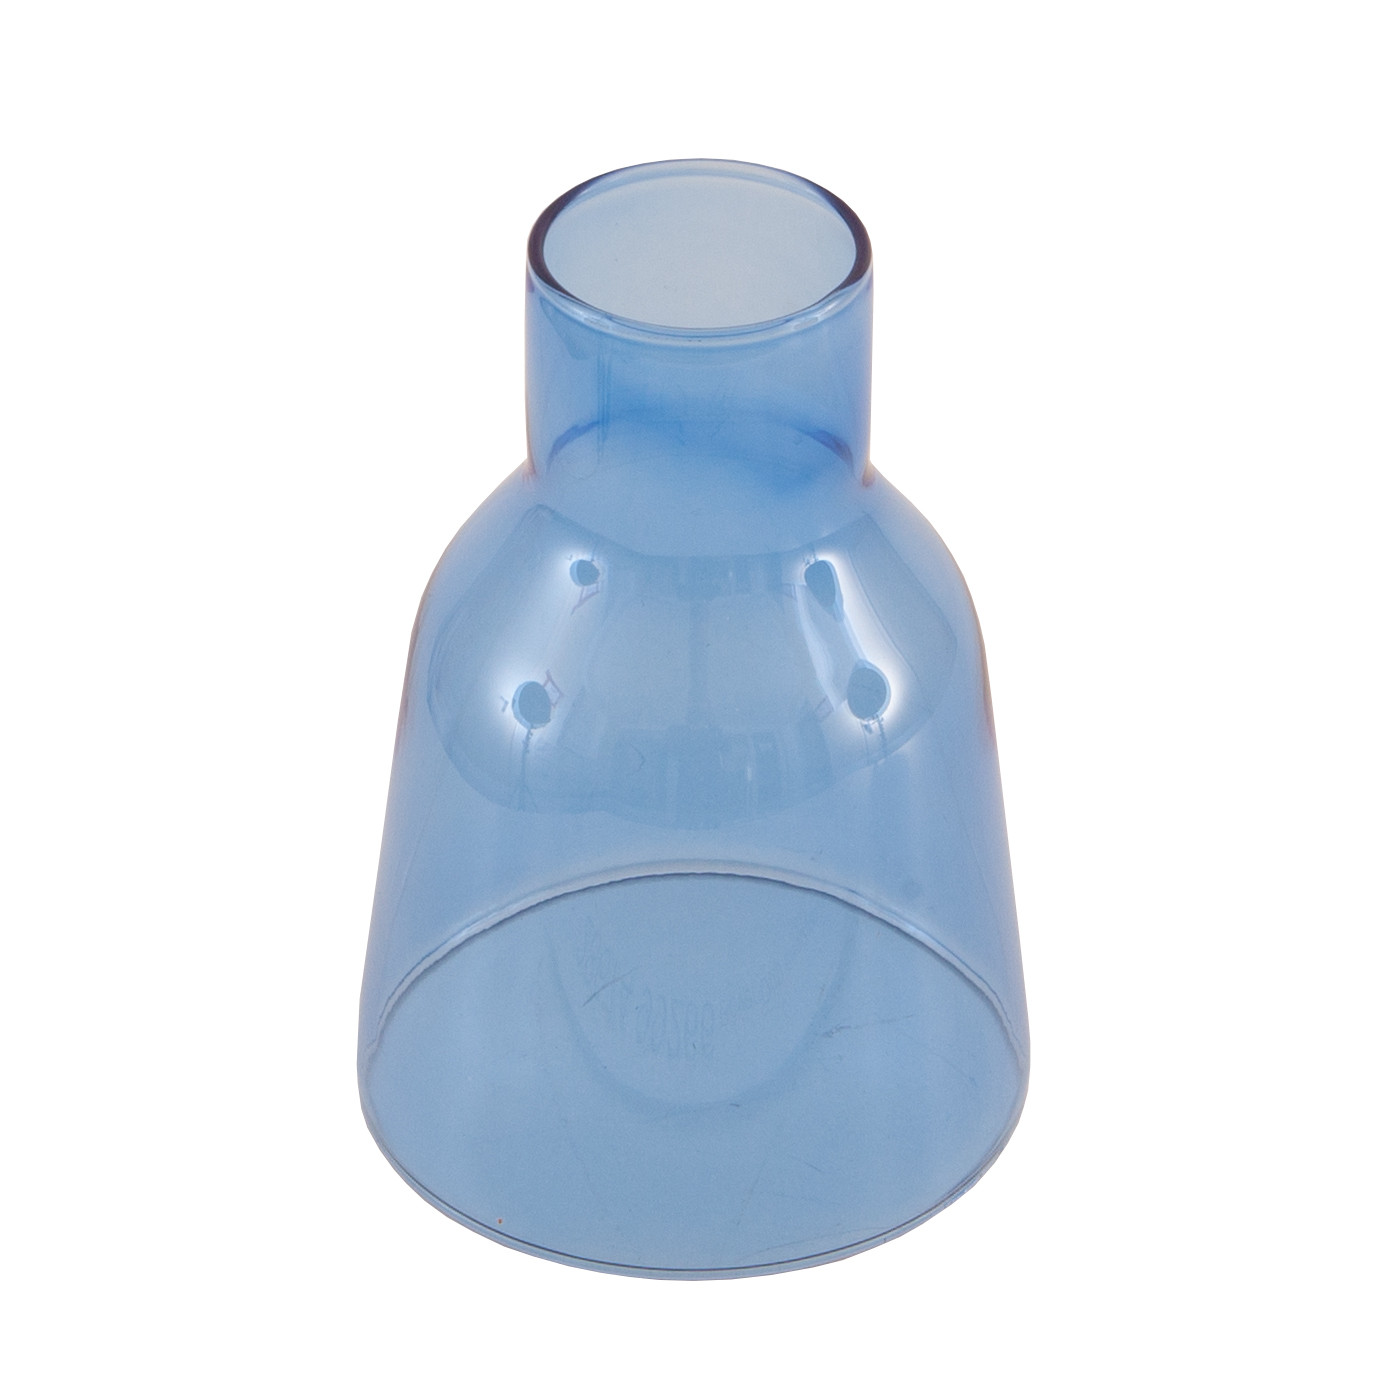 Bover Drip Ersatzglas